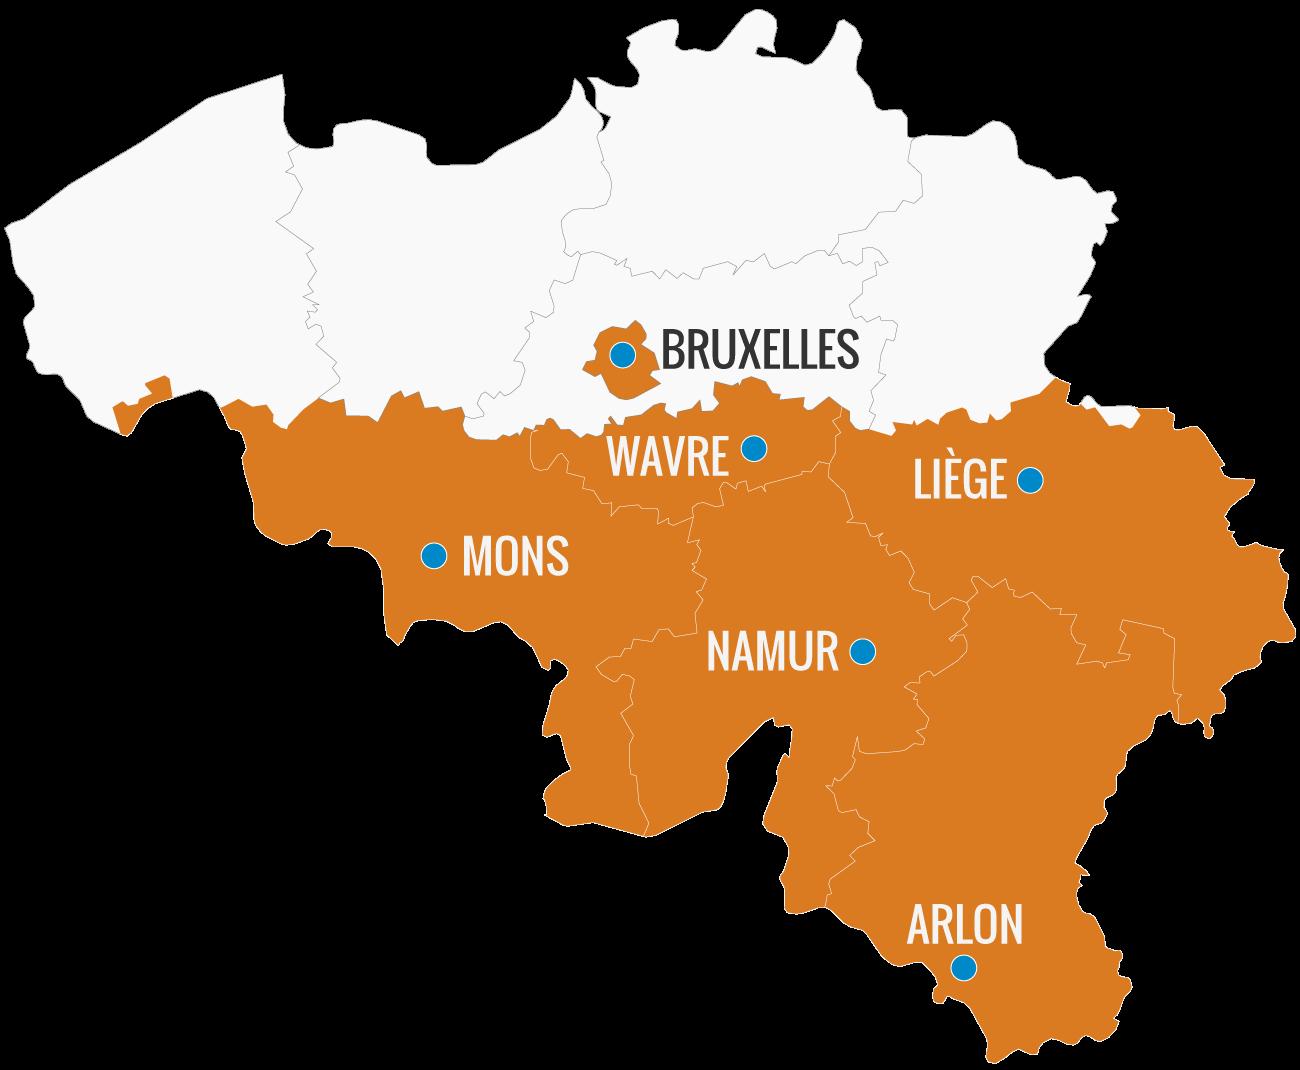 carte-belgique